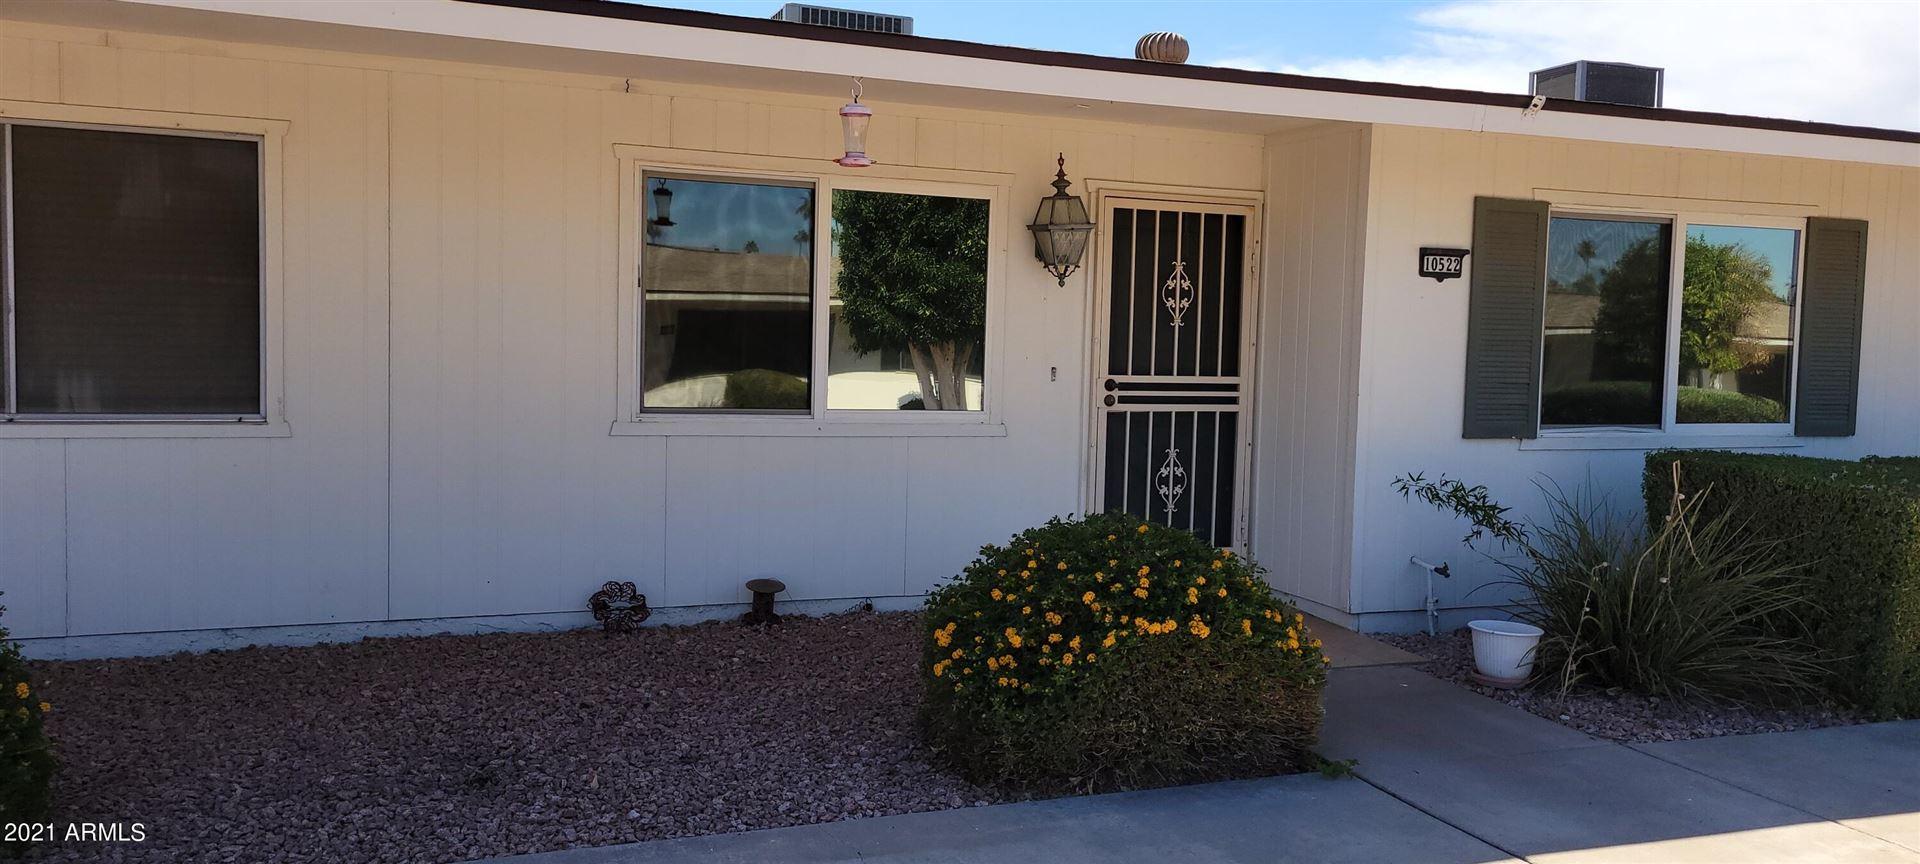 Photo of 10522 W COGGINS Drive, Sun City, AZ 85351 (MLS # 6249348)